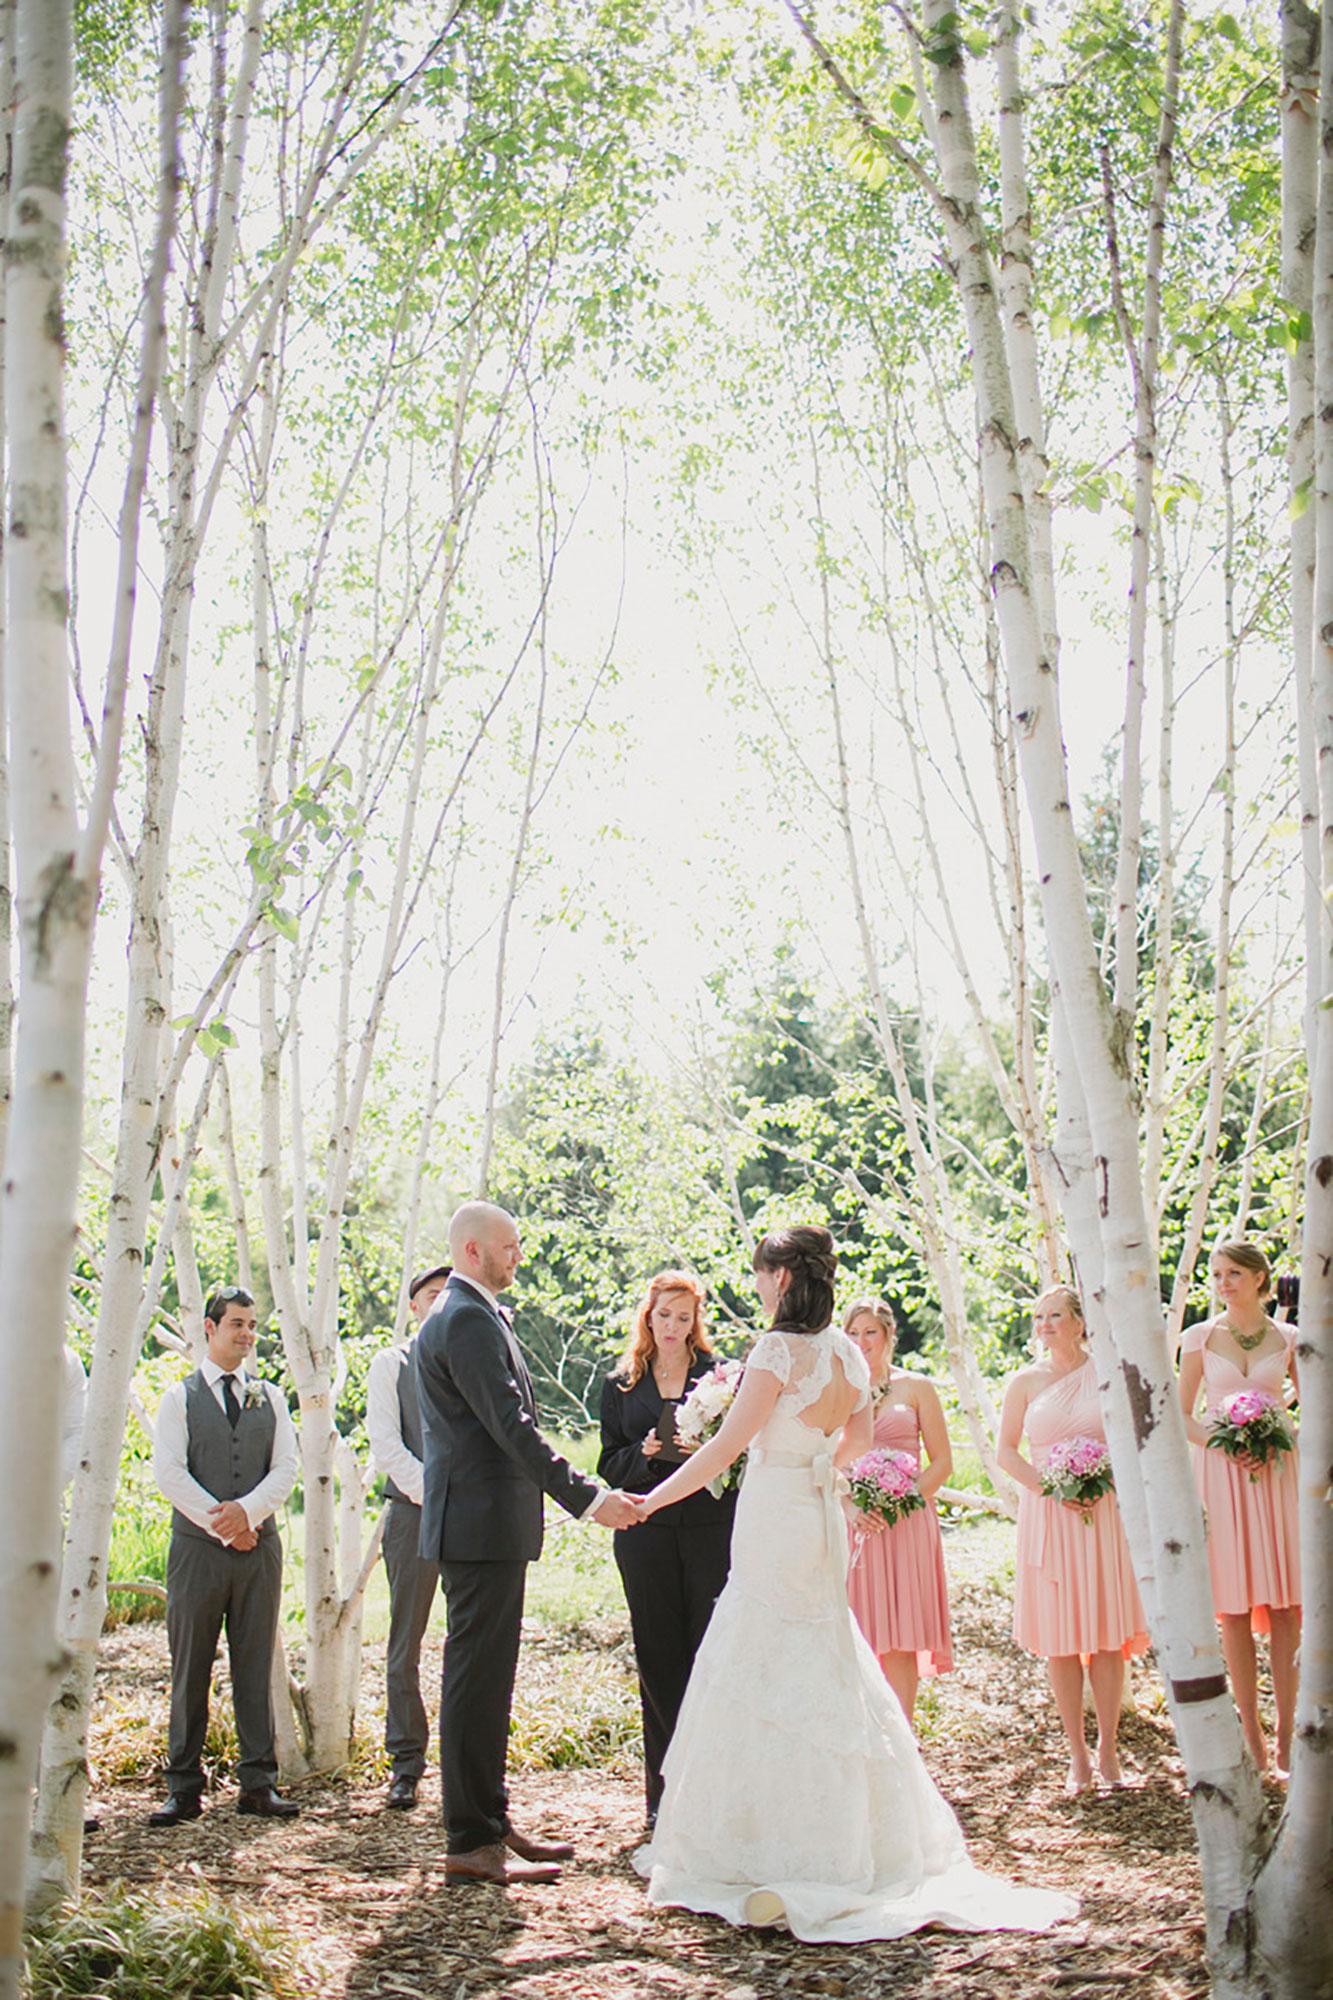 Balls-Falls-Vineyard-Bride-Photo-By-Elizabeth-in-Love-013.jpg